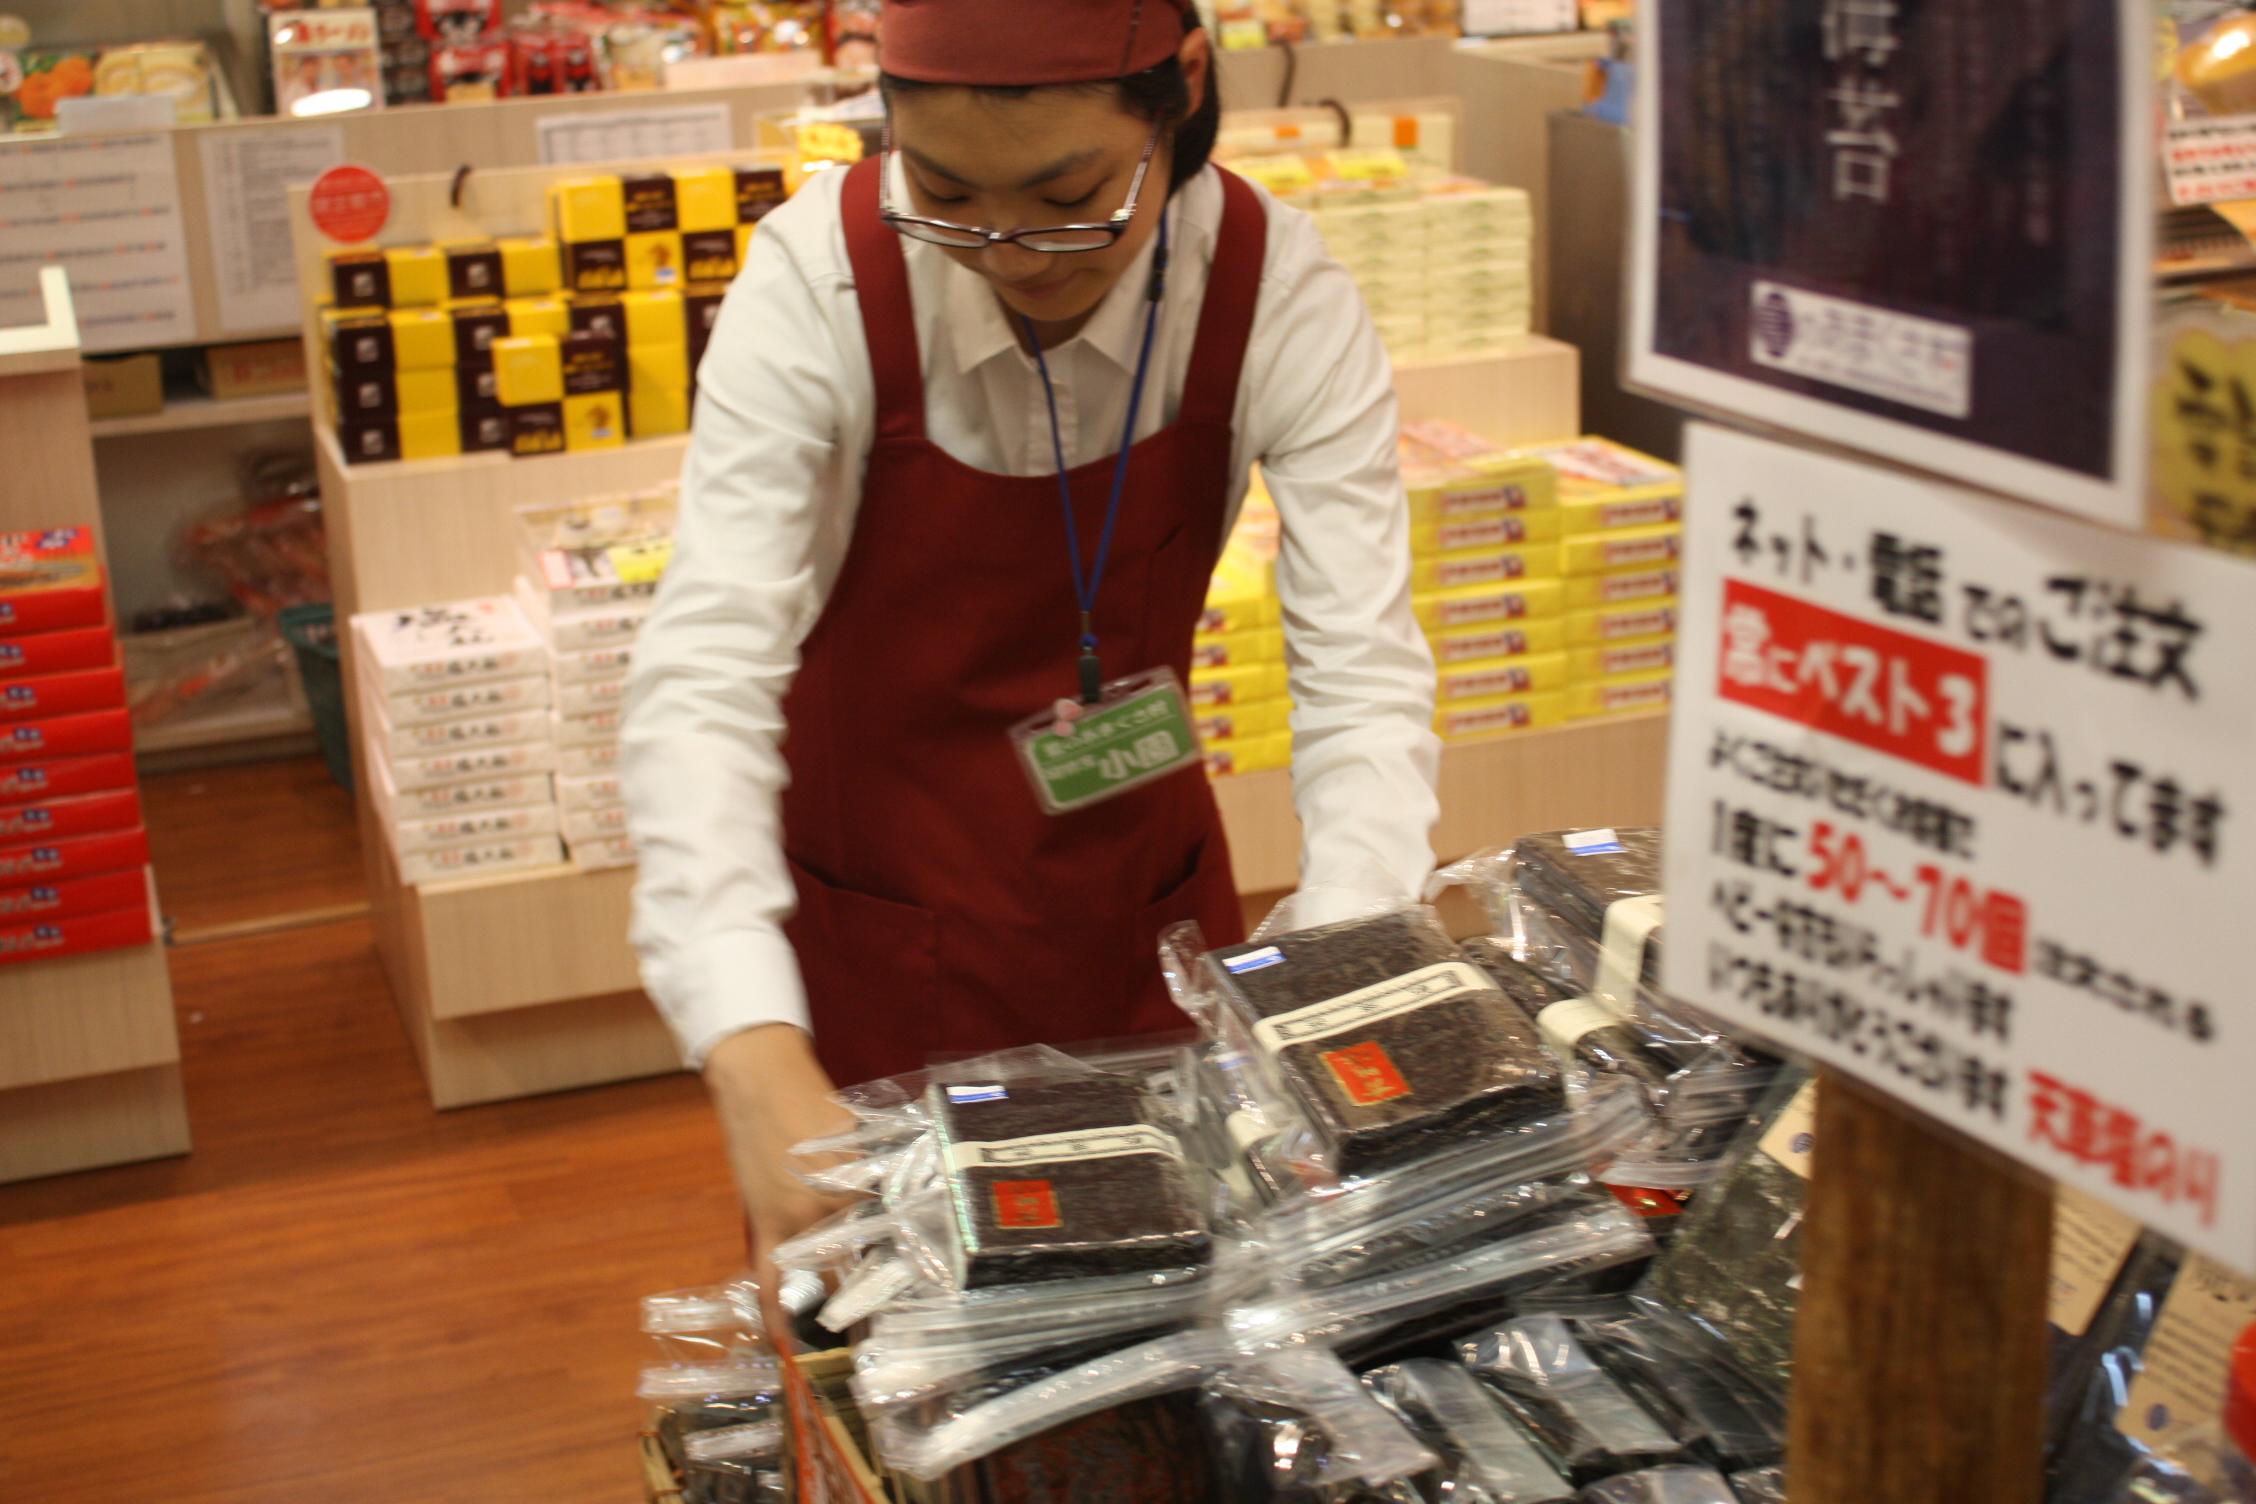 http://www.amakusamura.jp/staff/IMG_5542.JPG